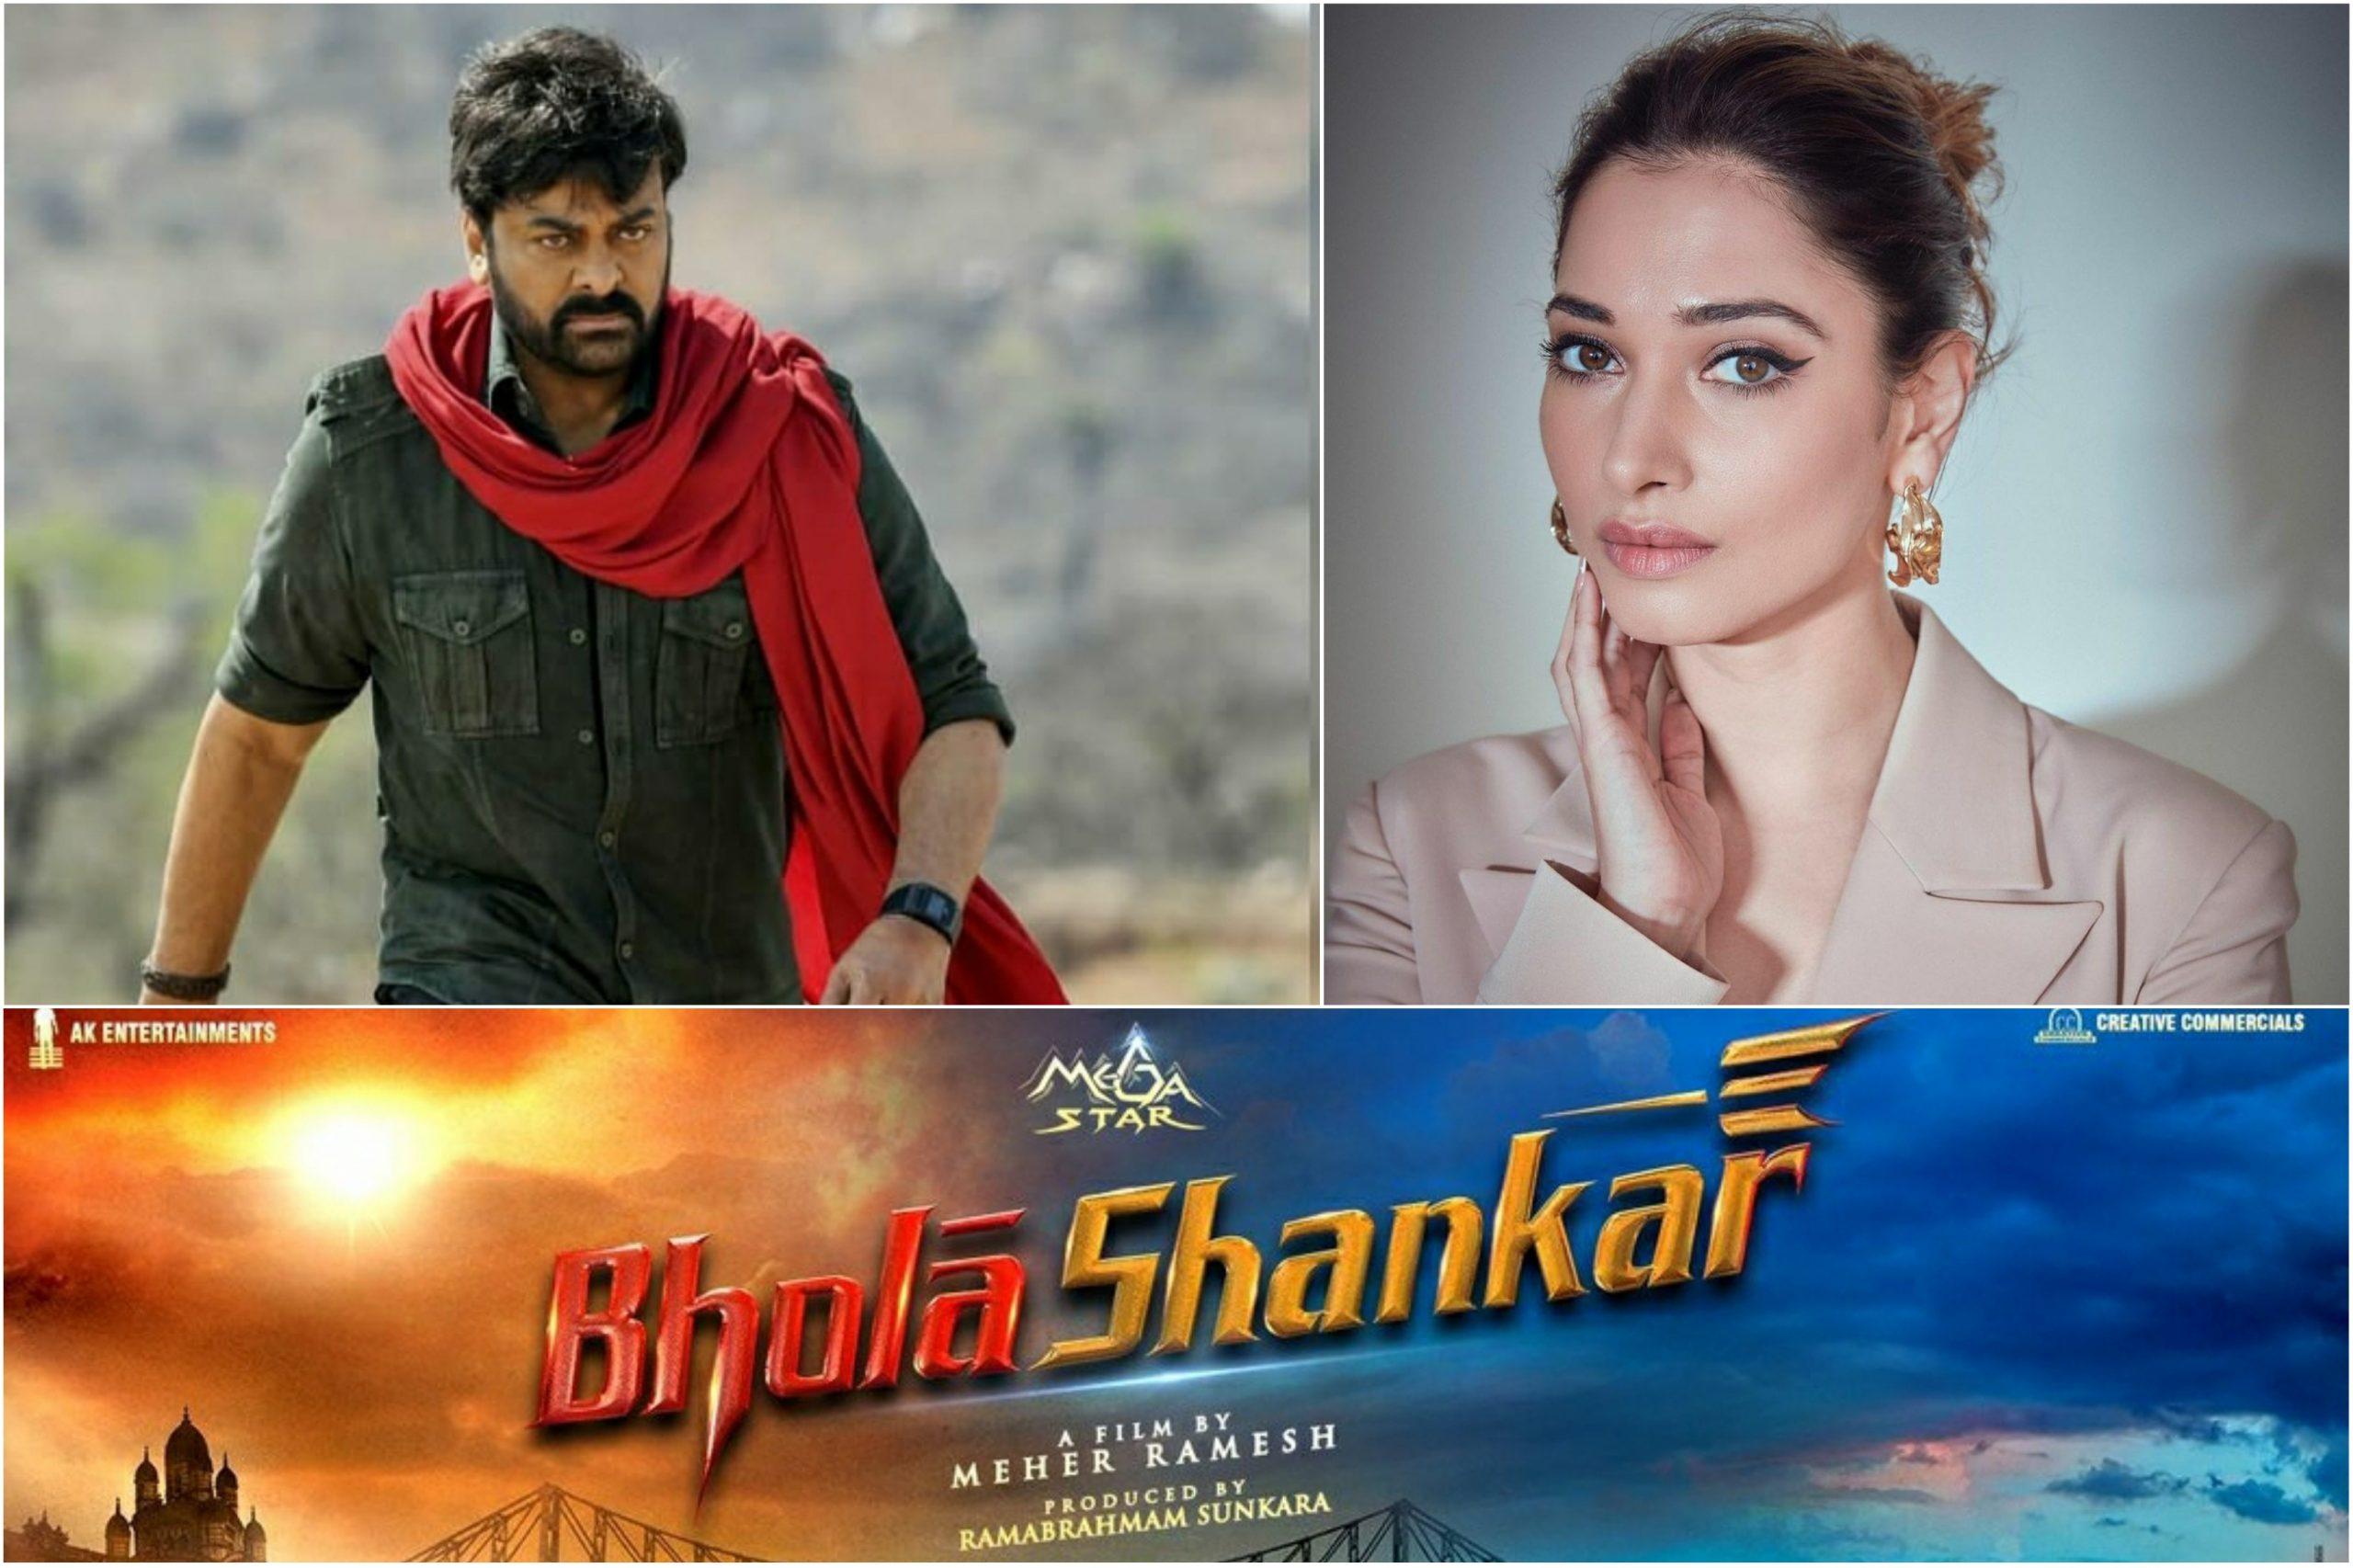 Tamannaah Bhatia to romance Megastar Chiranjeevi on the big screen?